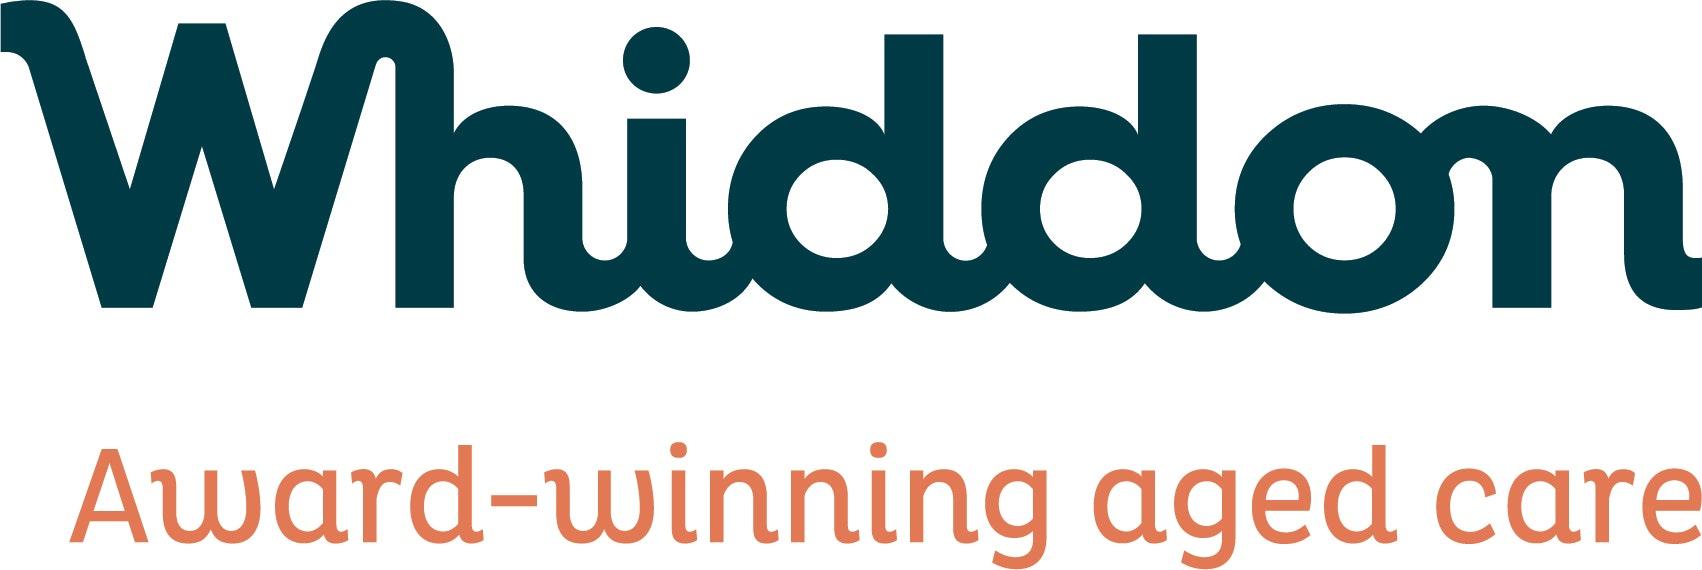 Whiddon Easton Park logo